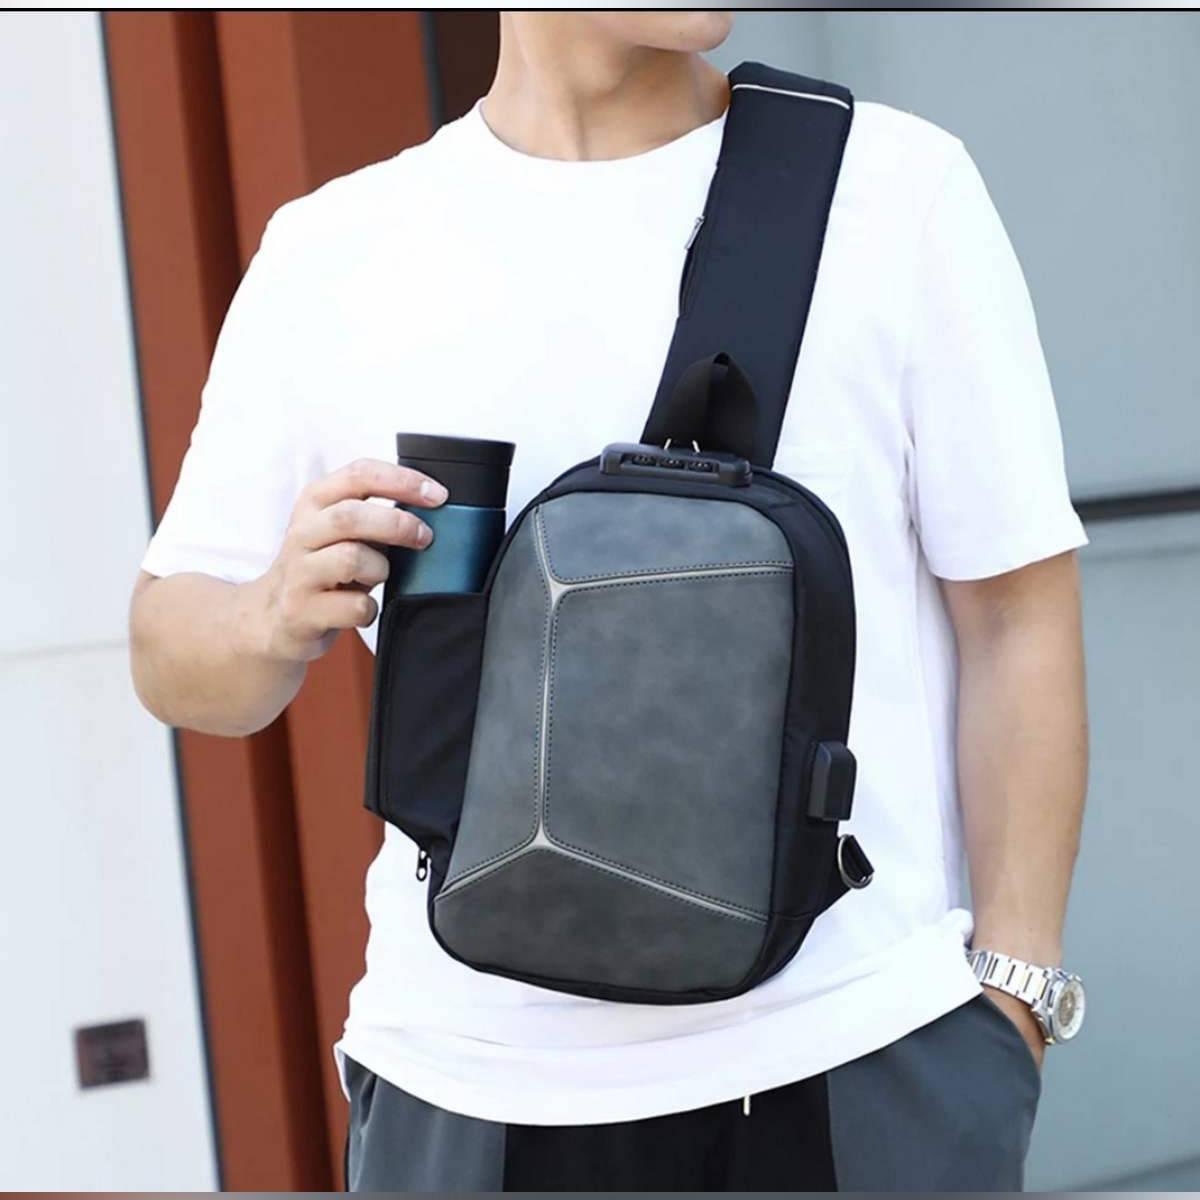 Anti-theft Crossbody Bag for Men/Men Sling Shoulder Bag/Men Chest Bag/Messenger Bag/Cross body Bag With Code Lock/Casual Bag with Leather Front